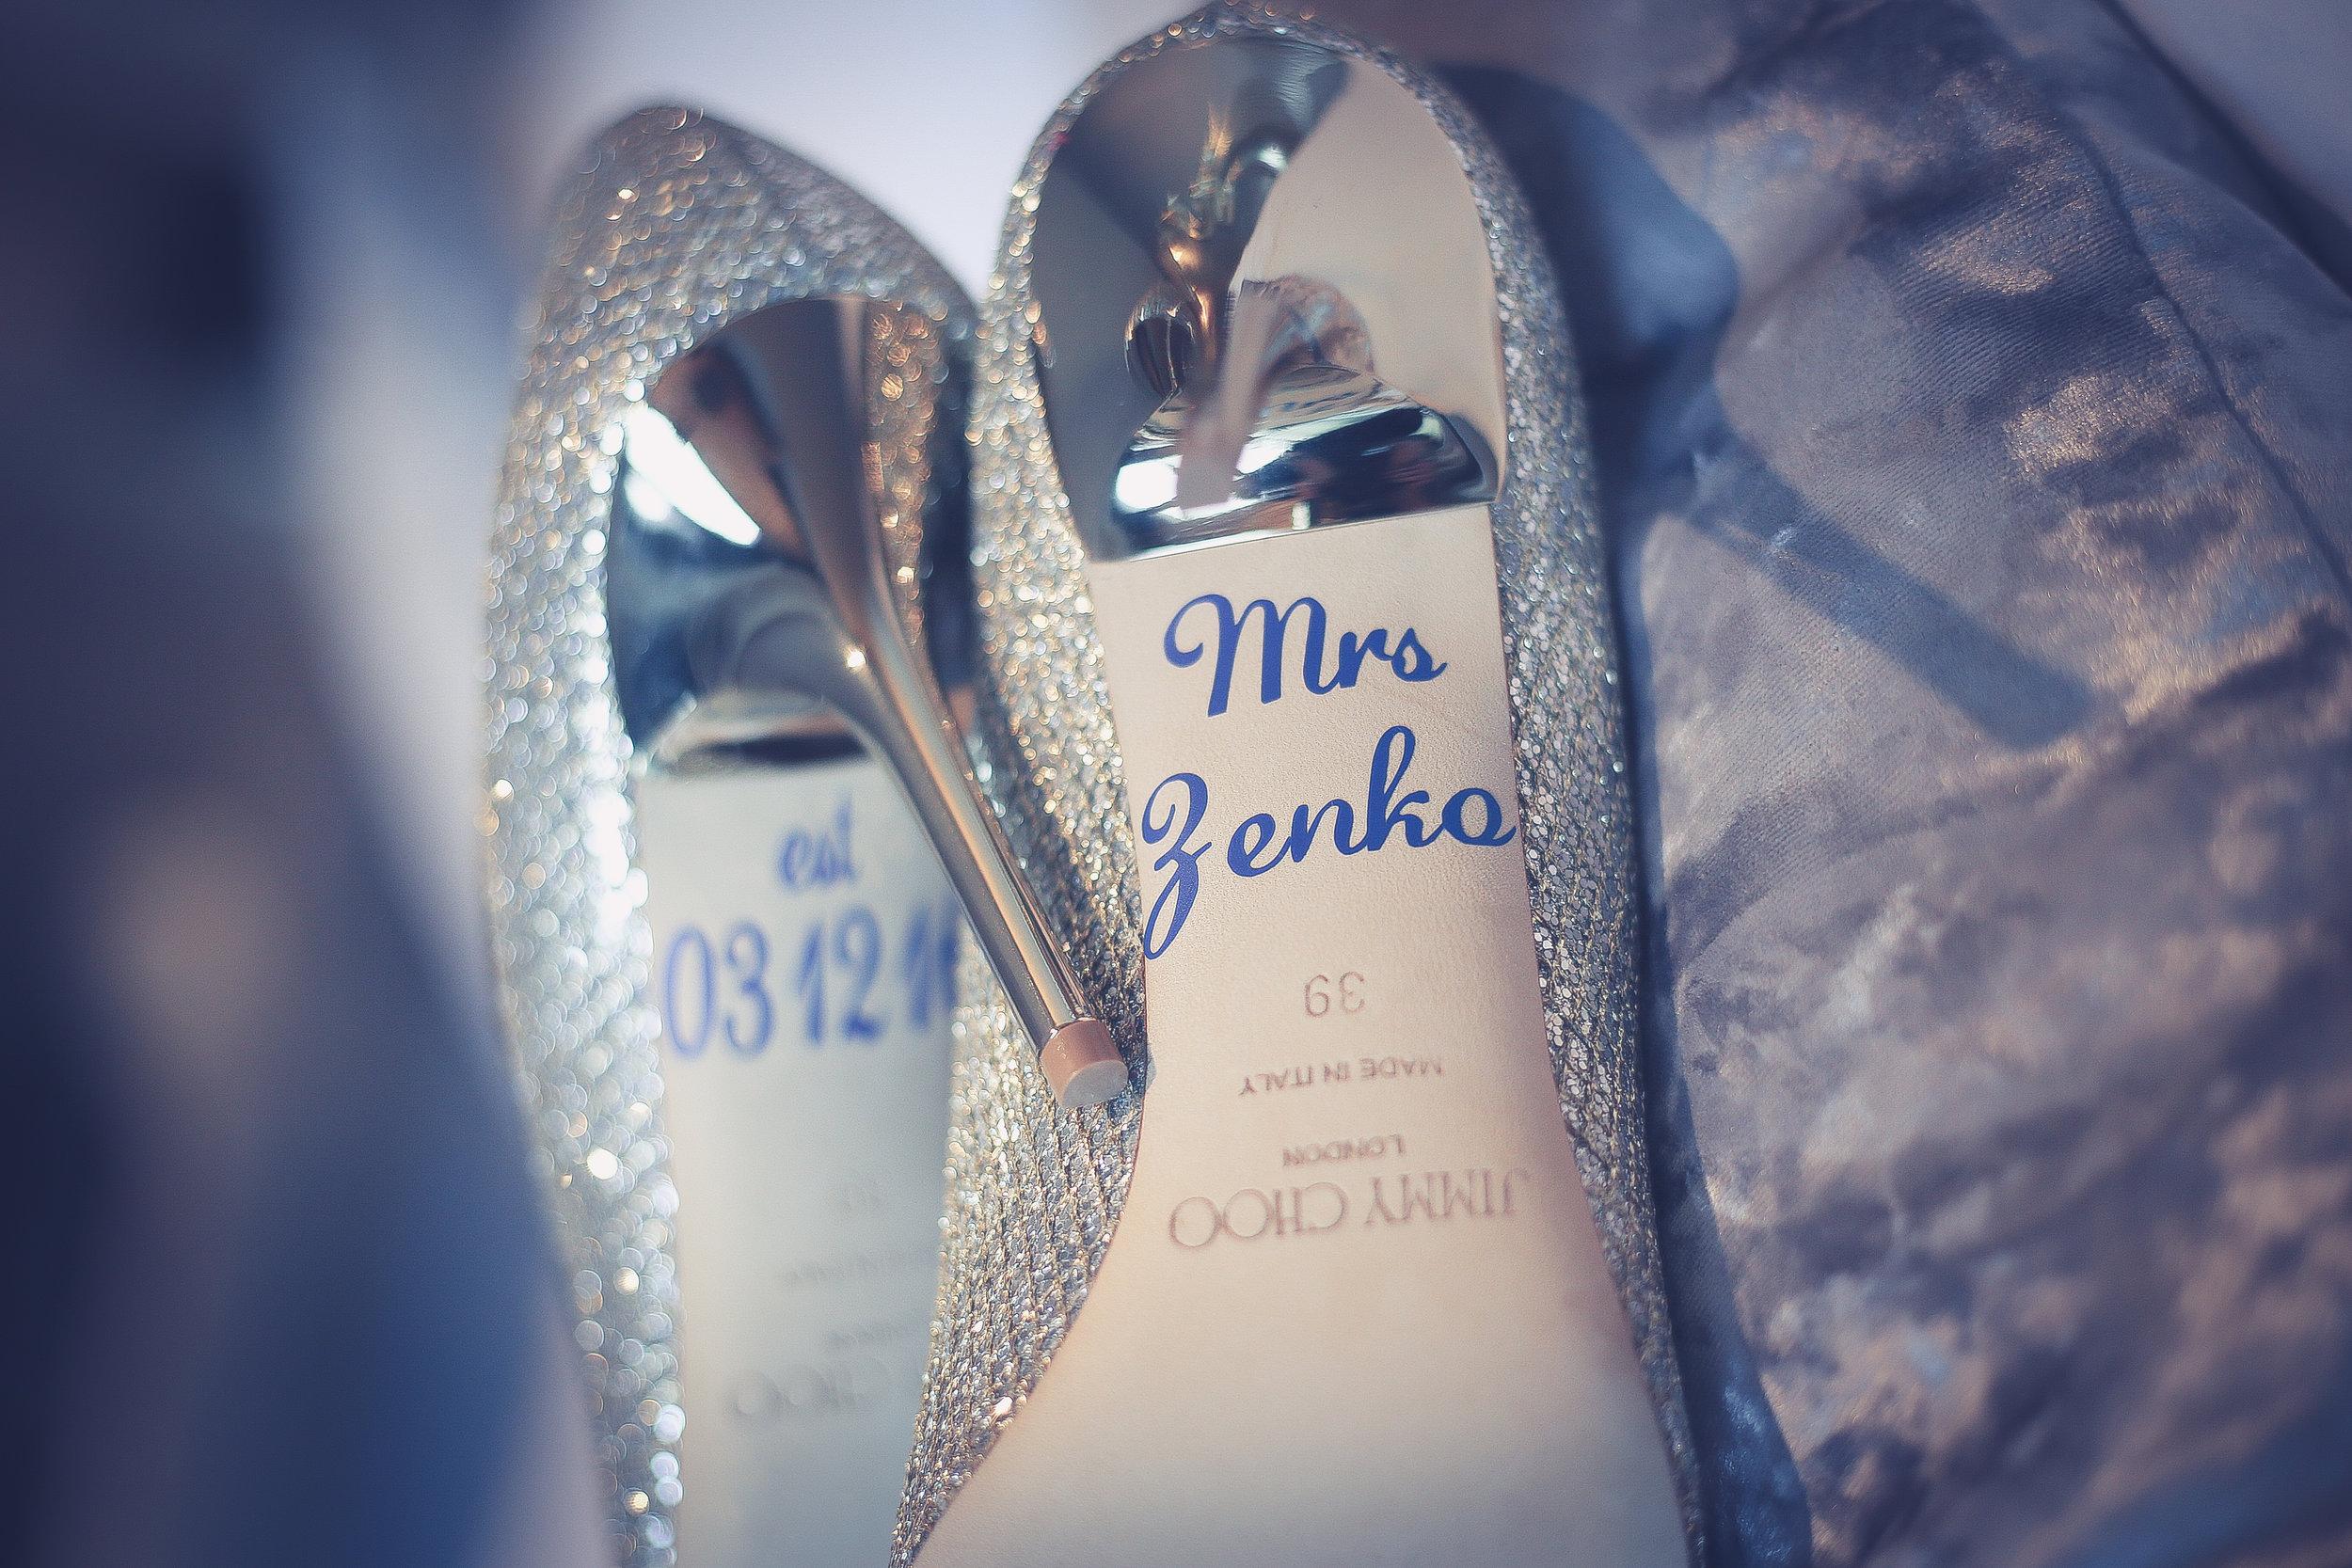 Weddings at the shankley hotel liverpool-1-19.jpg